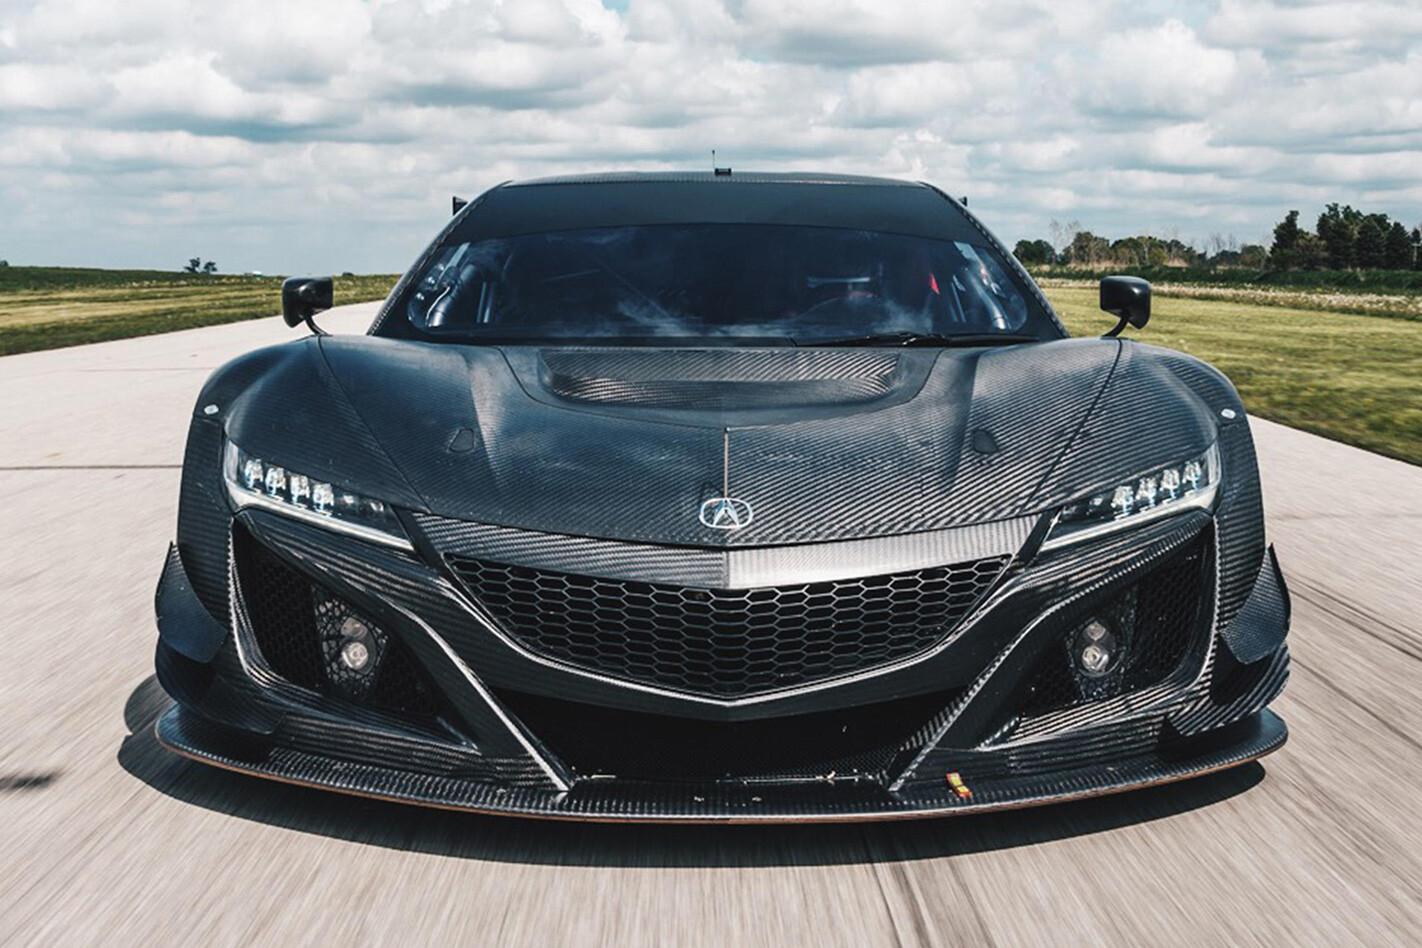 Honda NSX GT3 race car front